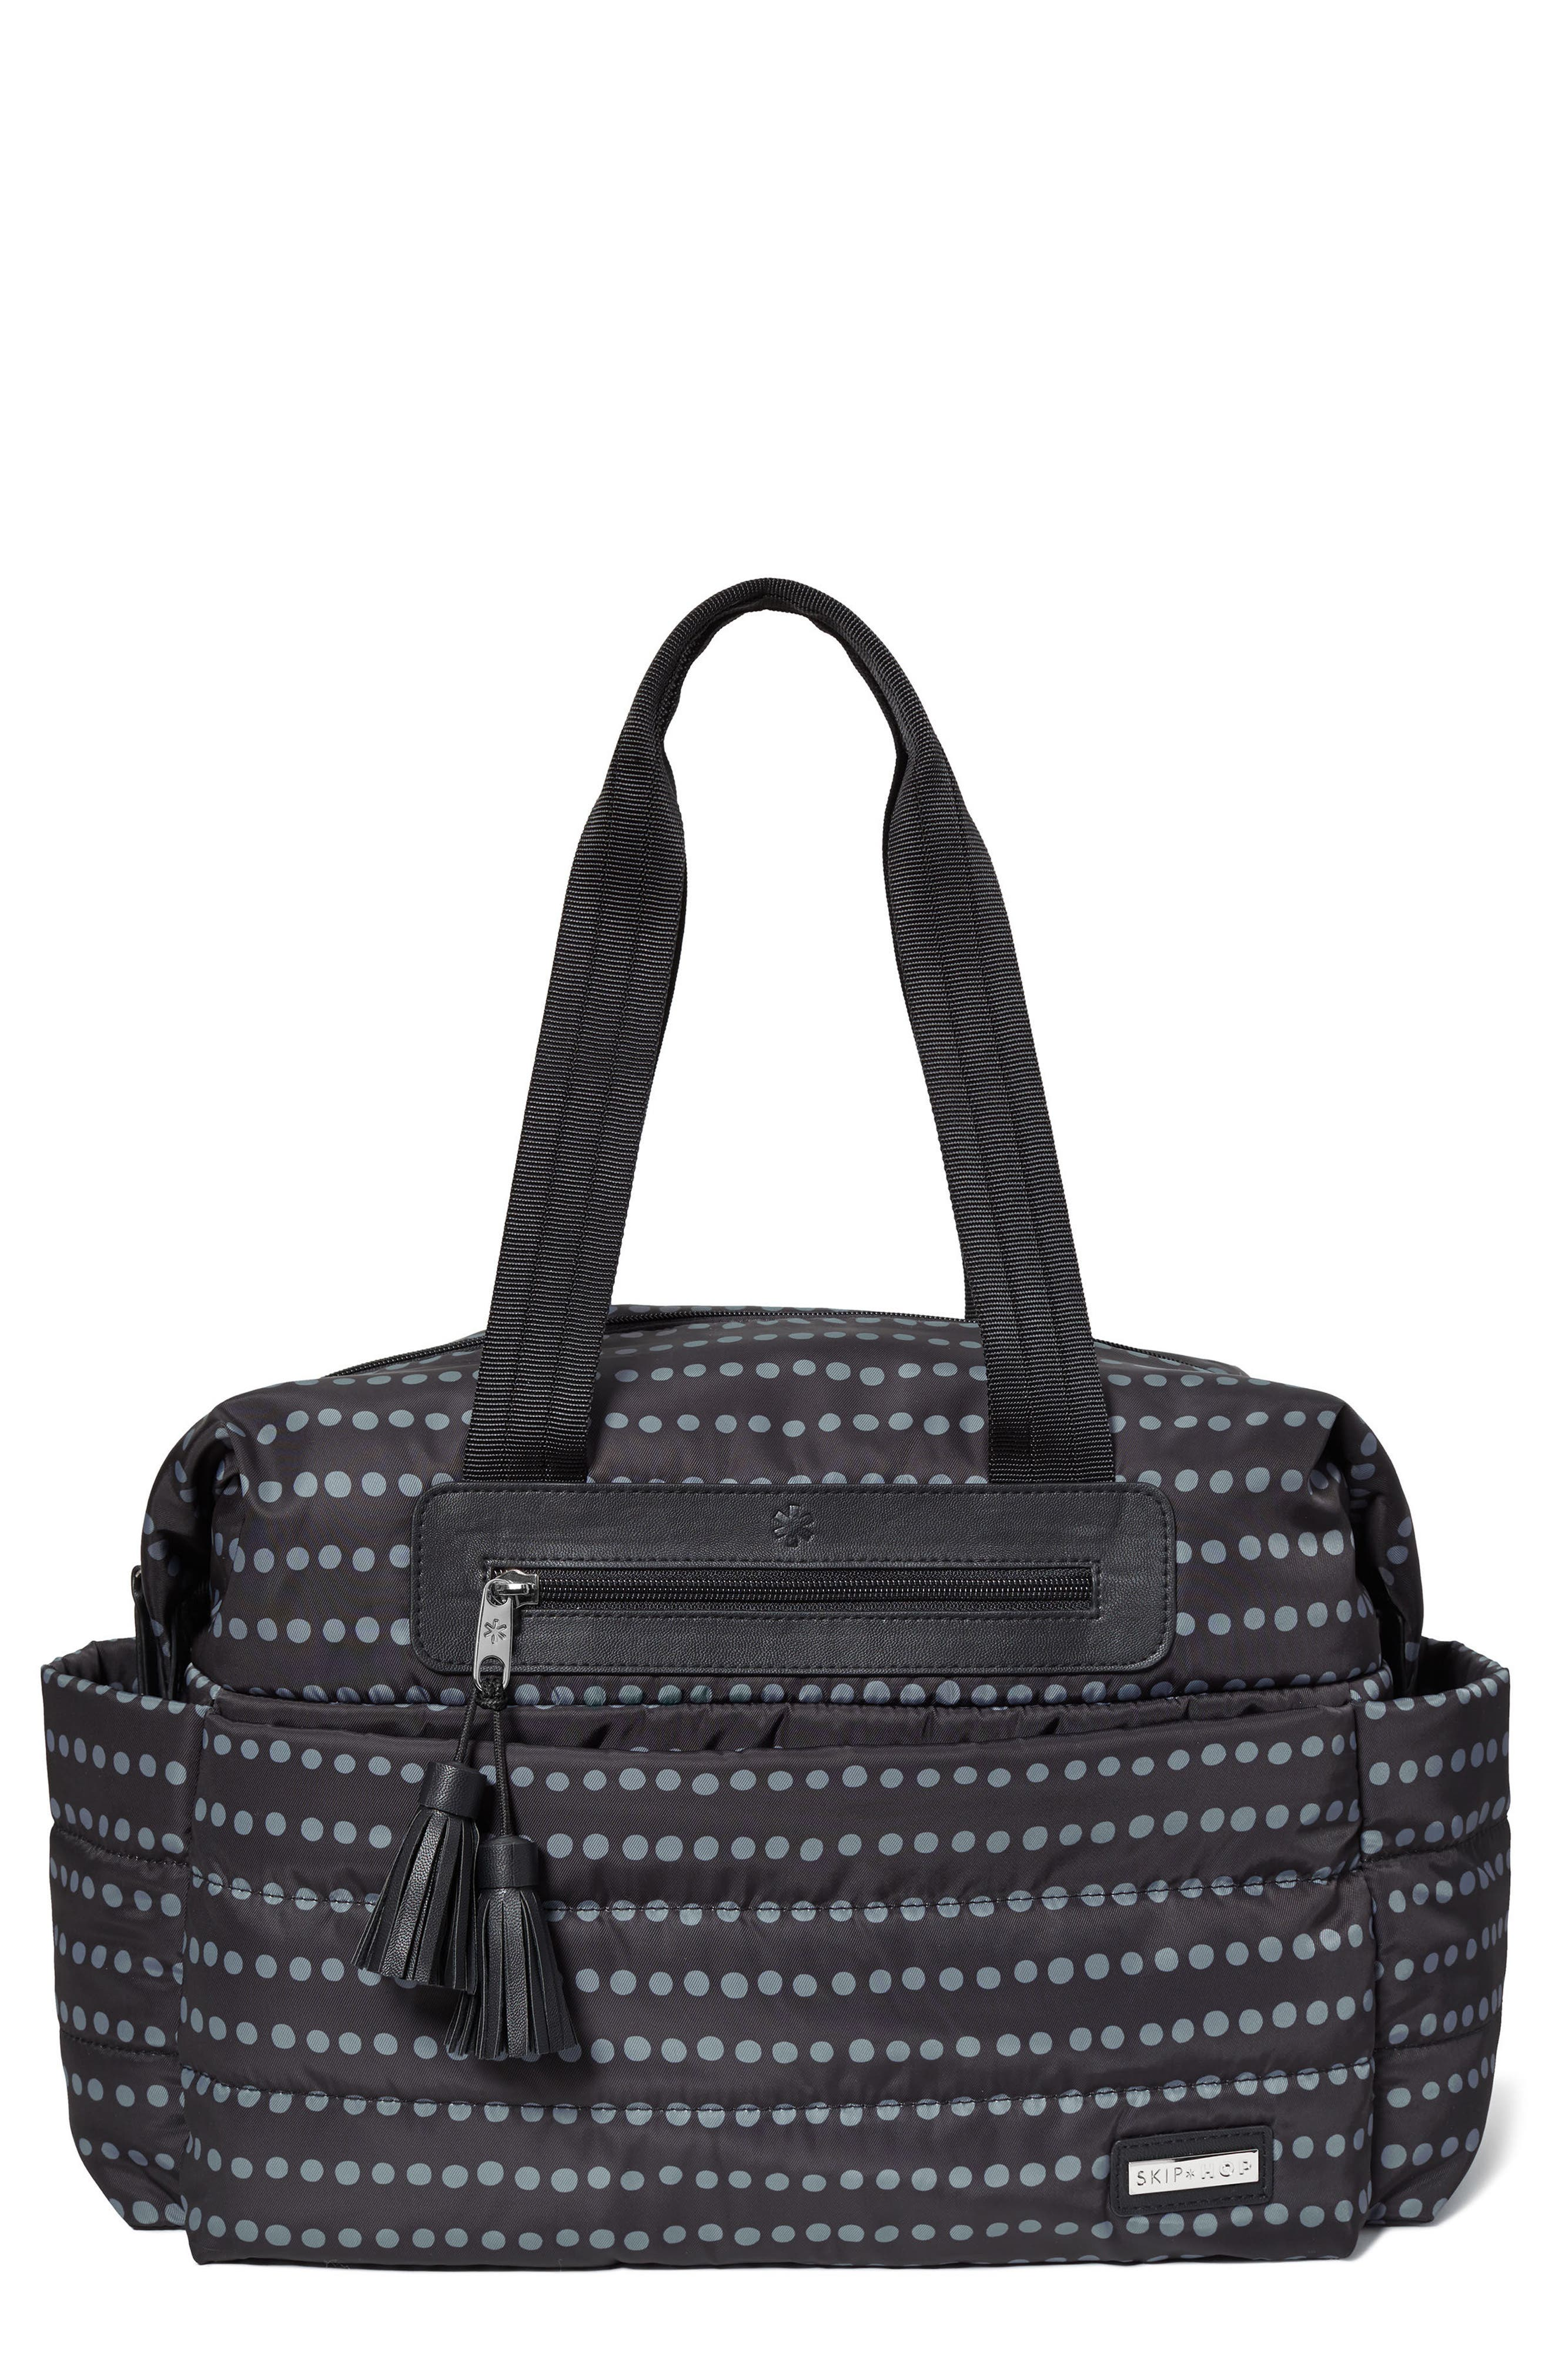 Skip Hop Riverside Diaper Bag